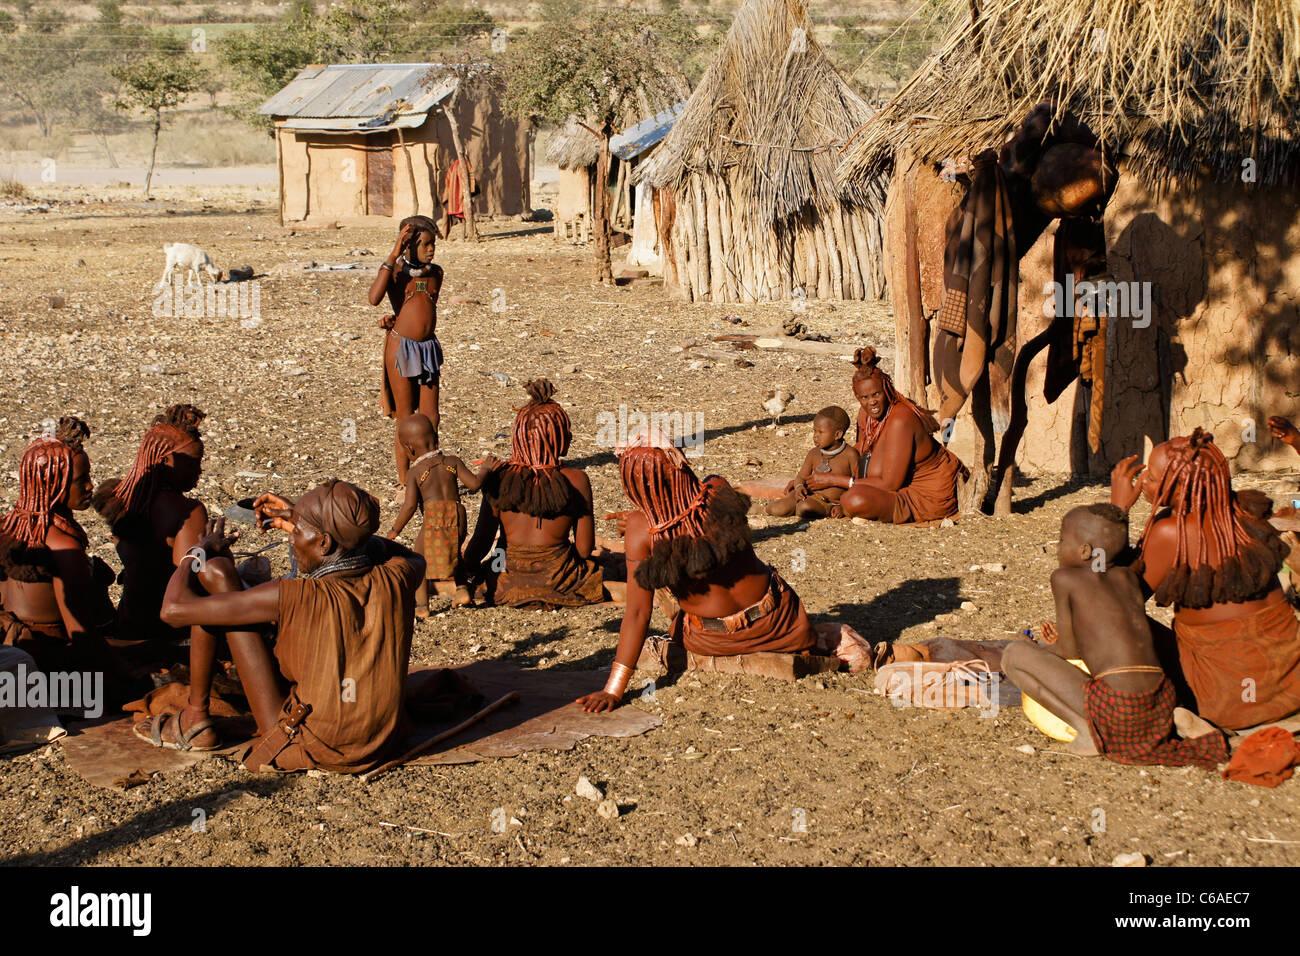 Himba people in their village near Opuwo, Namibia - Stock Image